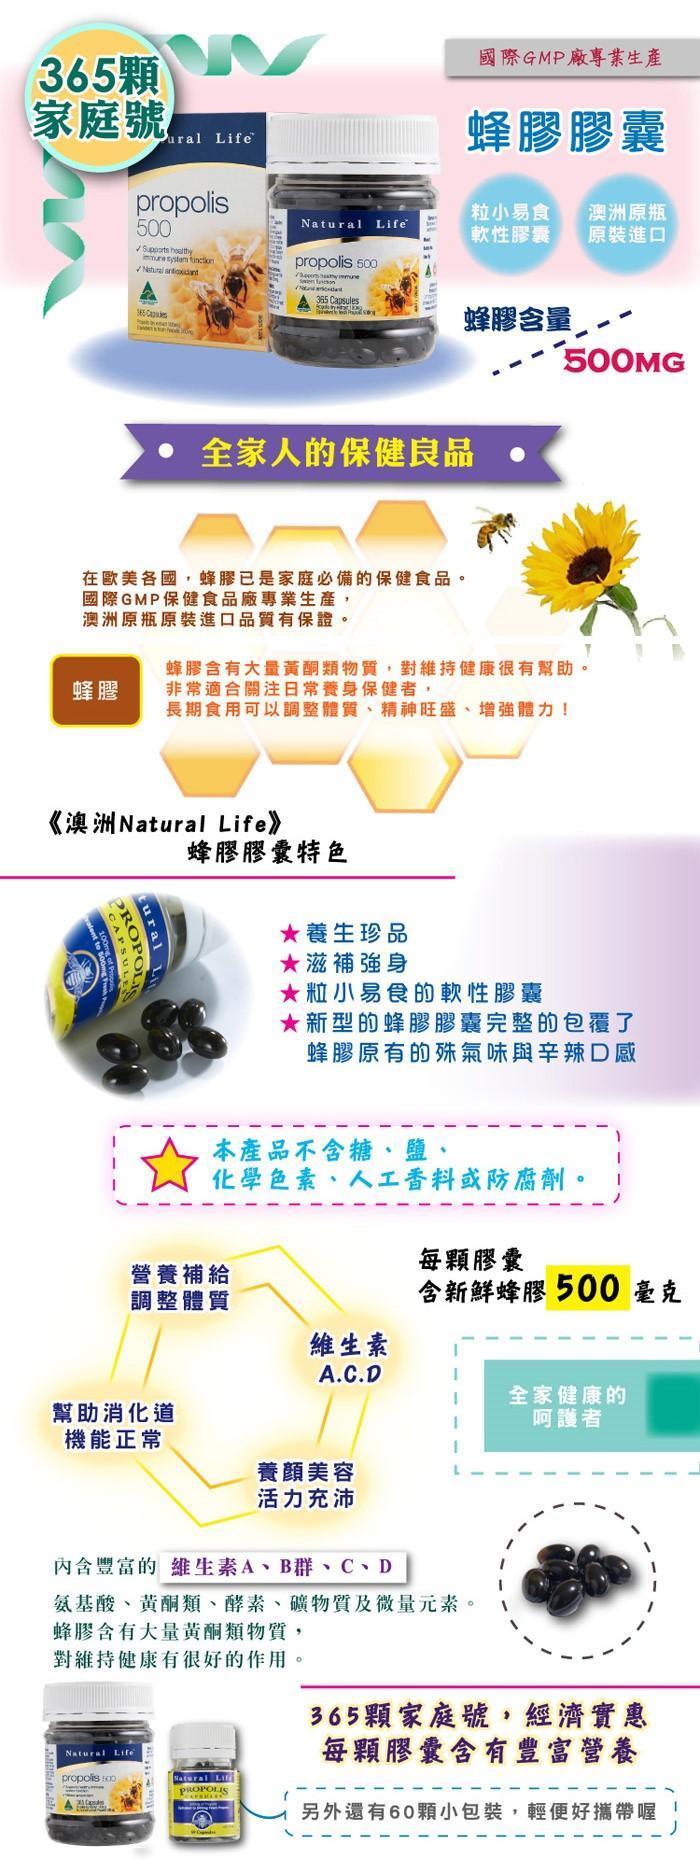 Natural Life-澳洲蜂膠膠囊500mg(365粒)產品資訊